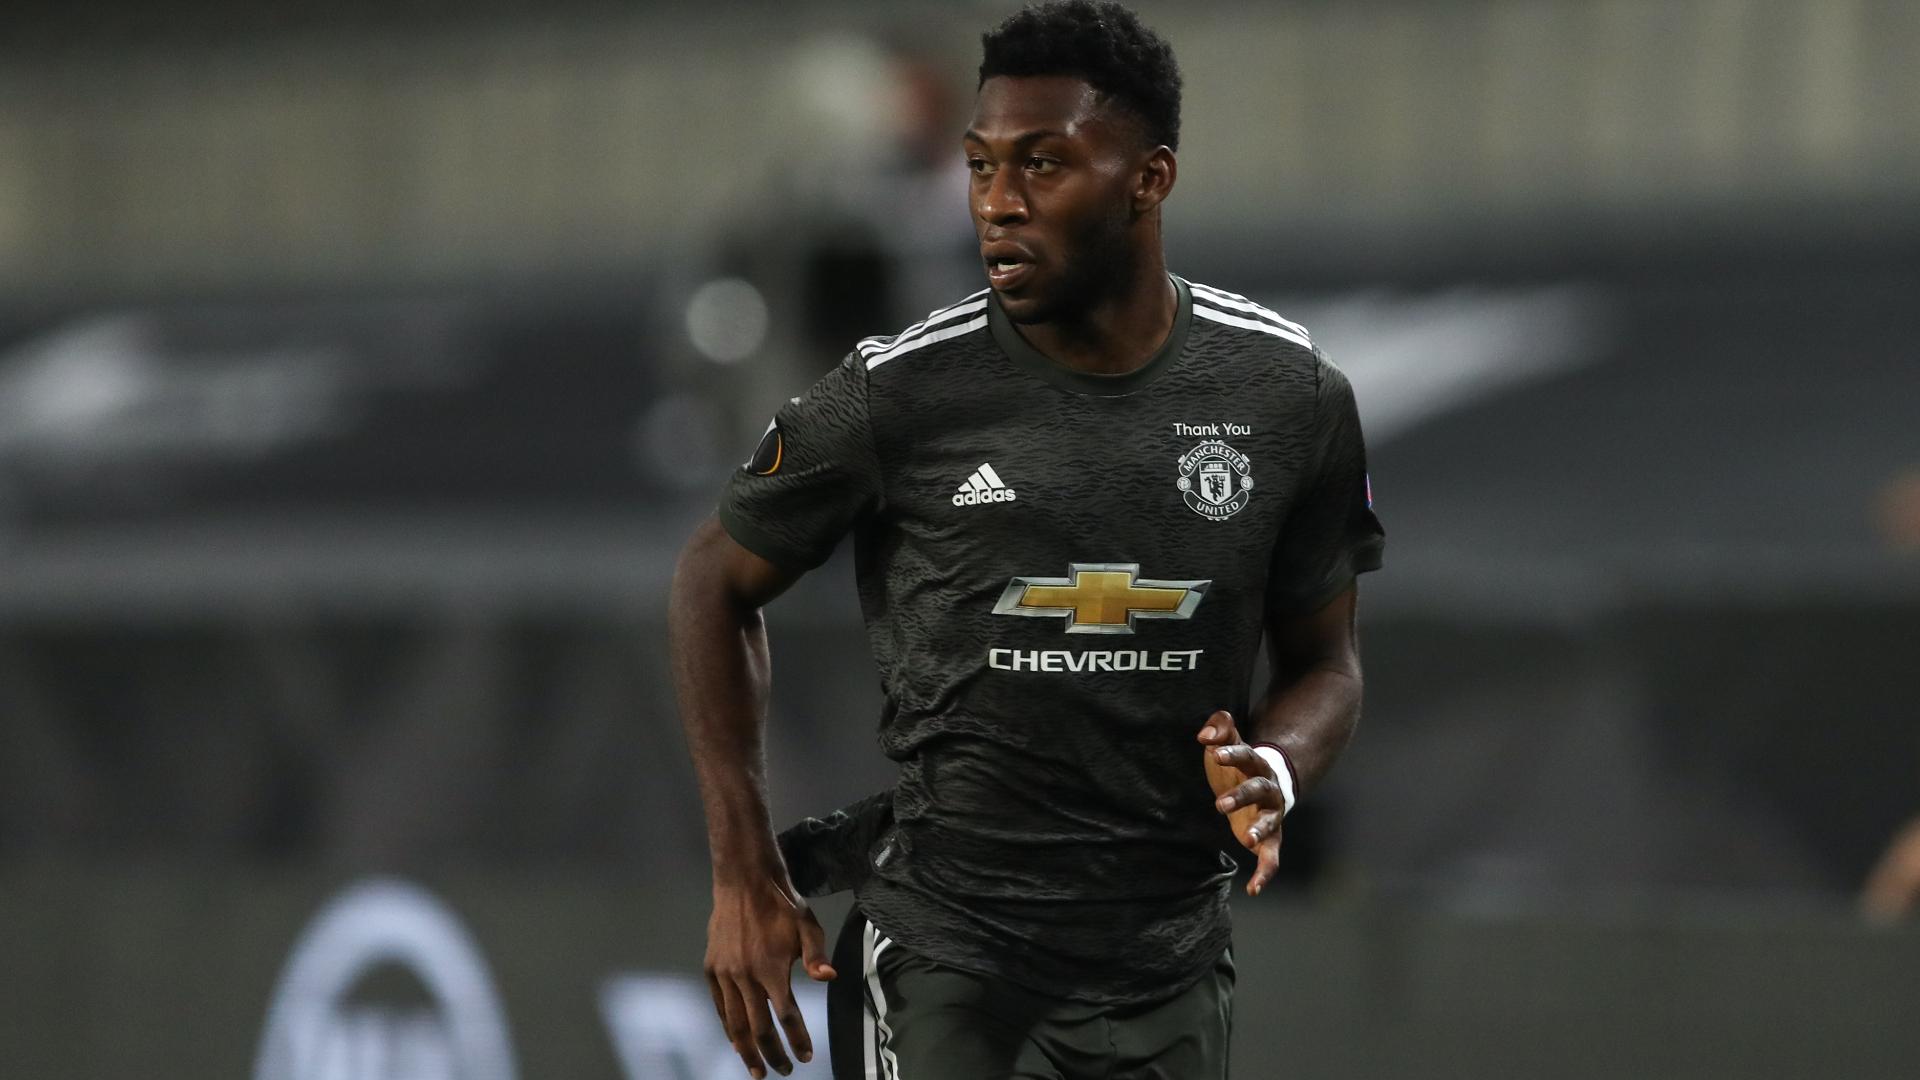 Fosu-Mensah joins Bayer Leverkusen from Manchester United